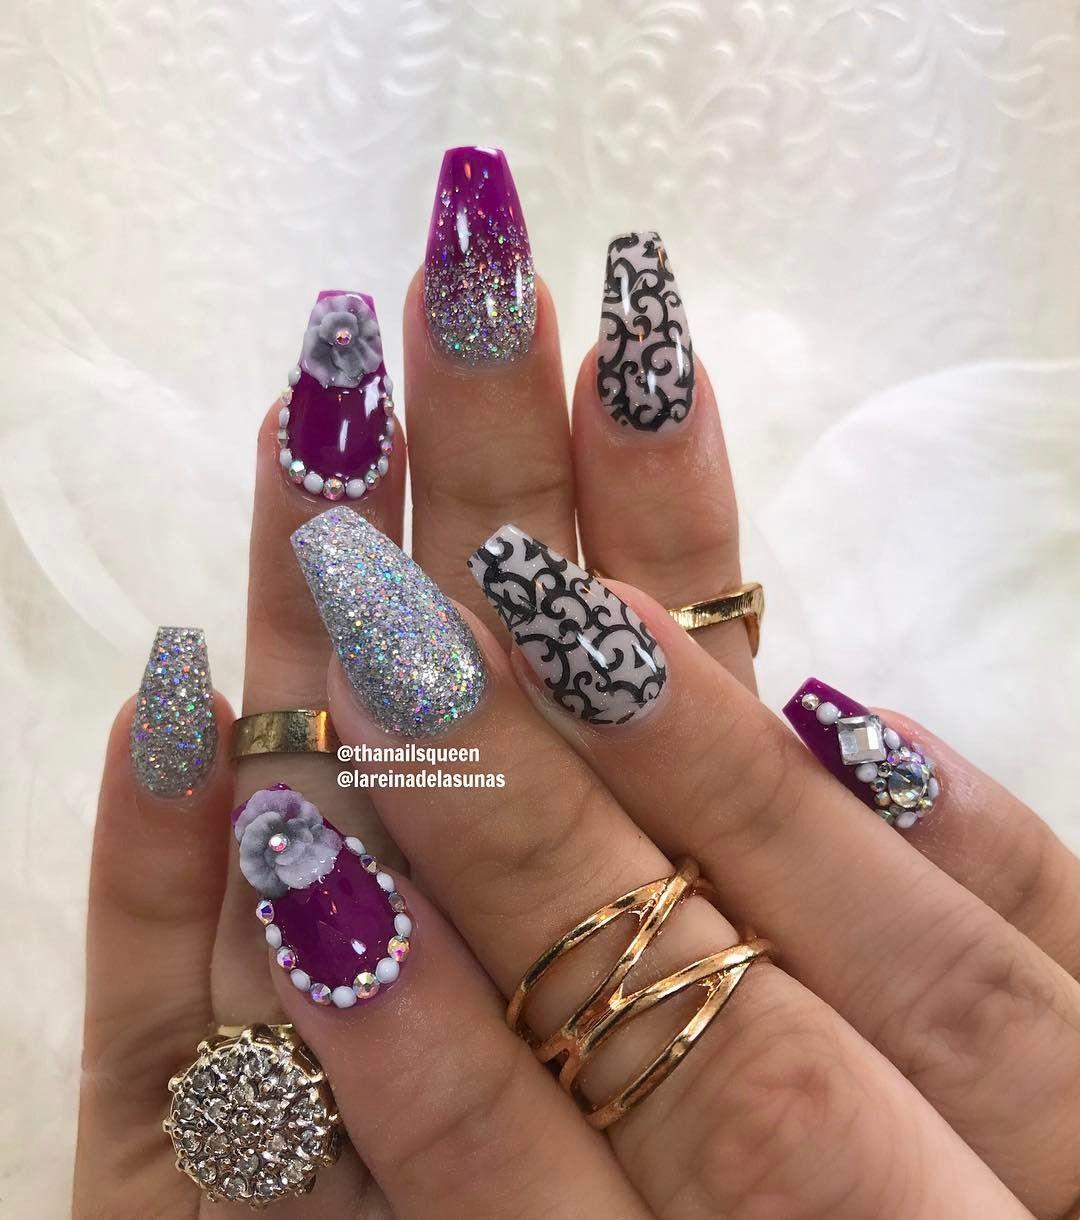 Pin by Alisha Needham on Nails | Pinterest | Snapchat and Instagram